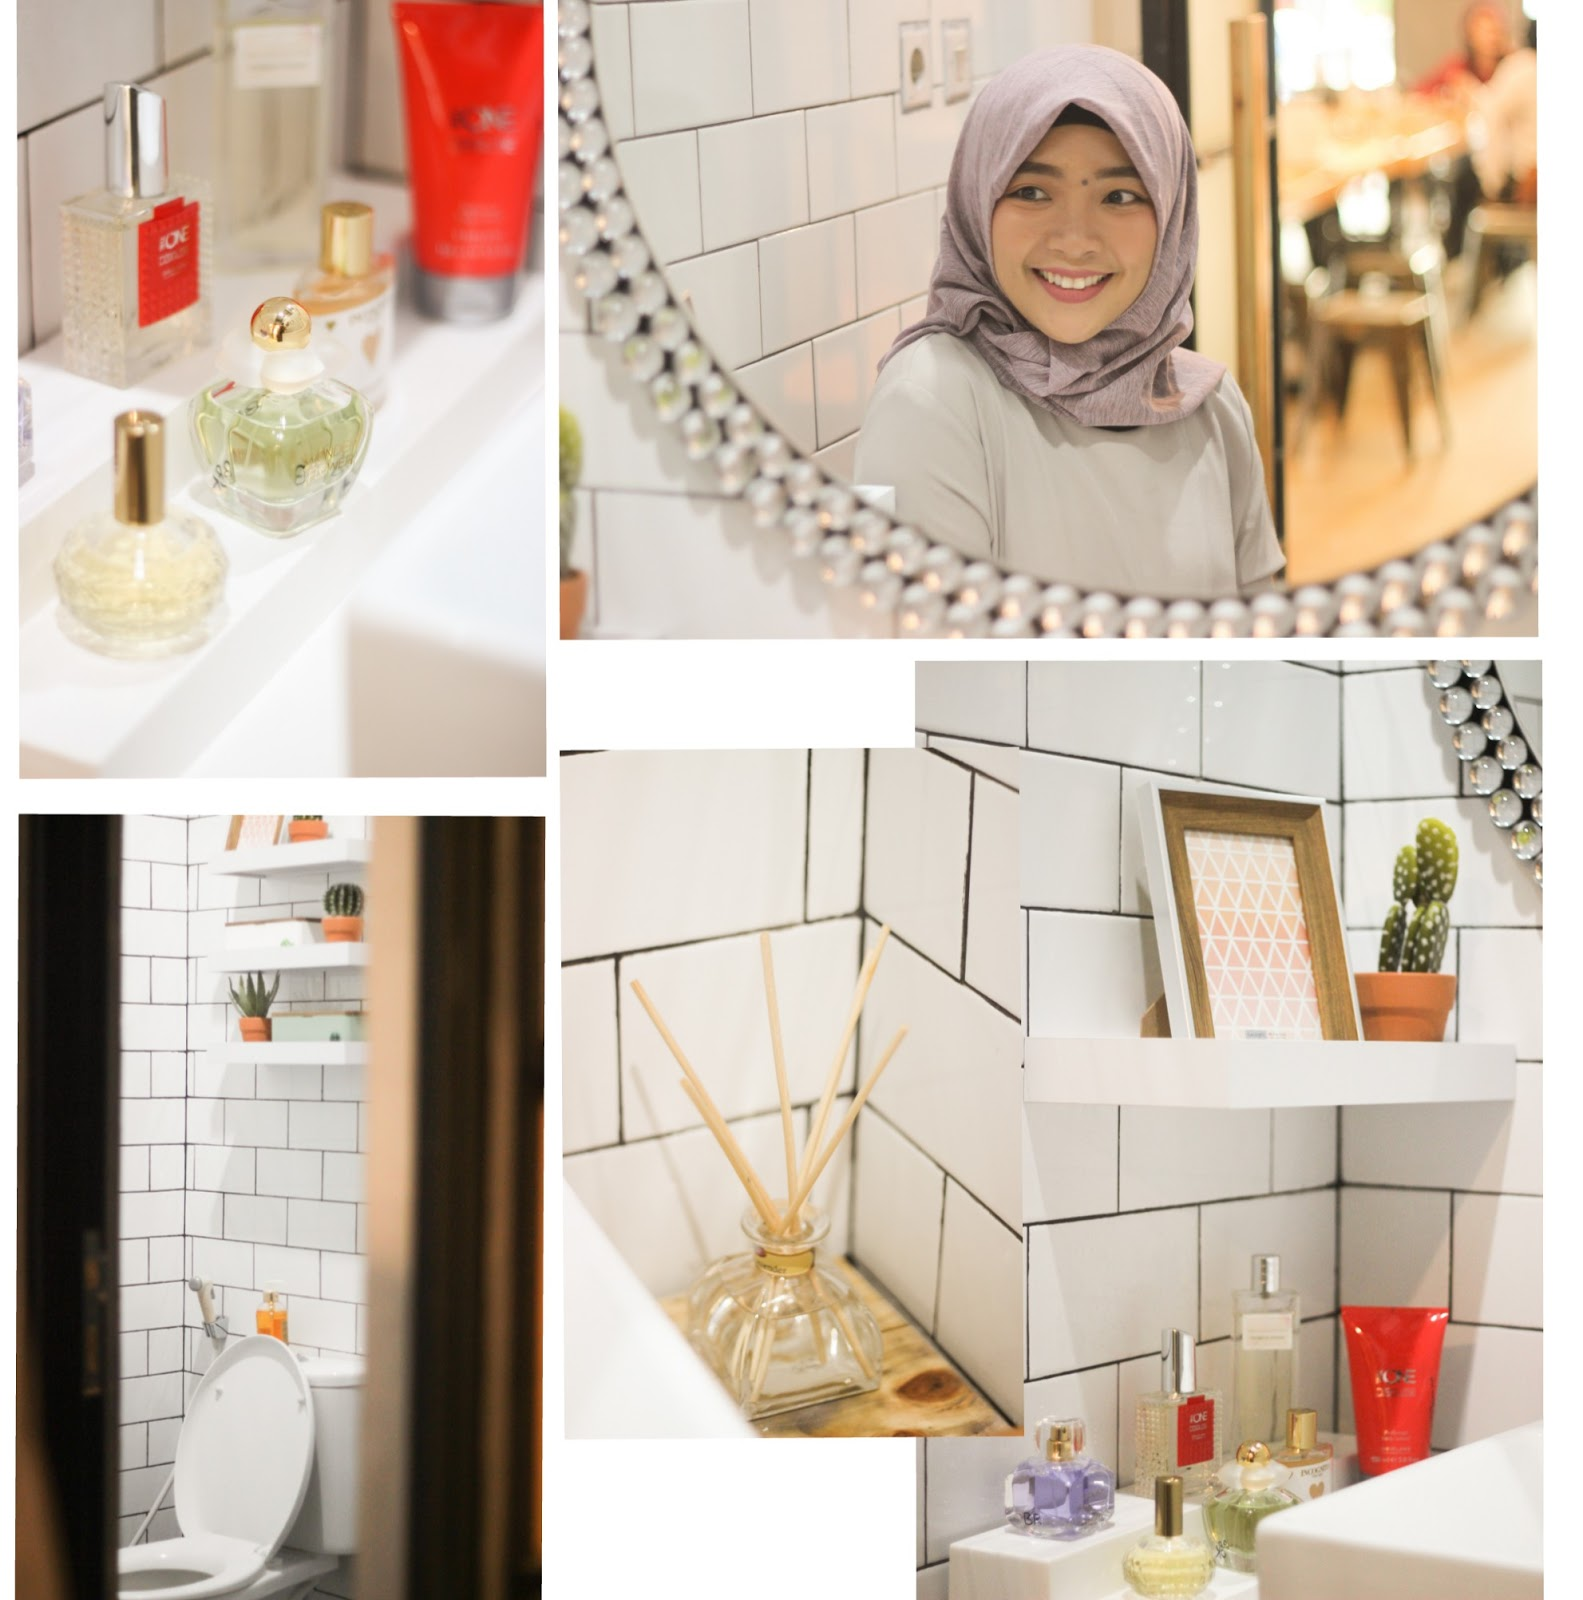 toilet Boerdjo Rakyat Bersih - ernykurnia